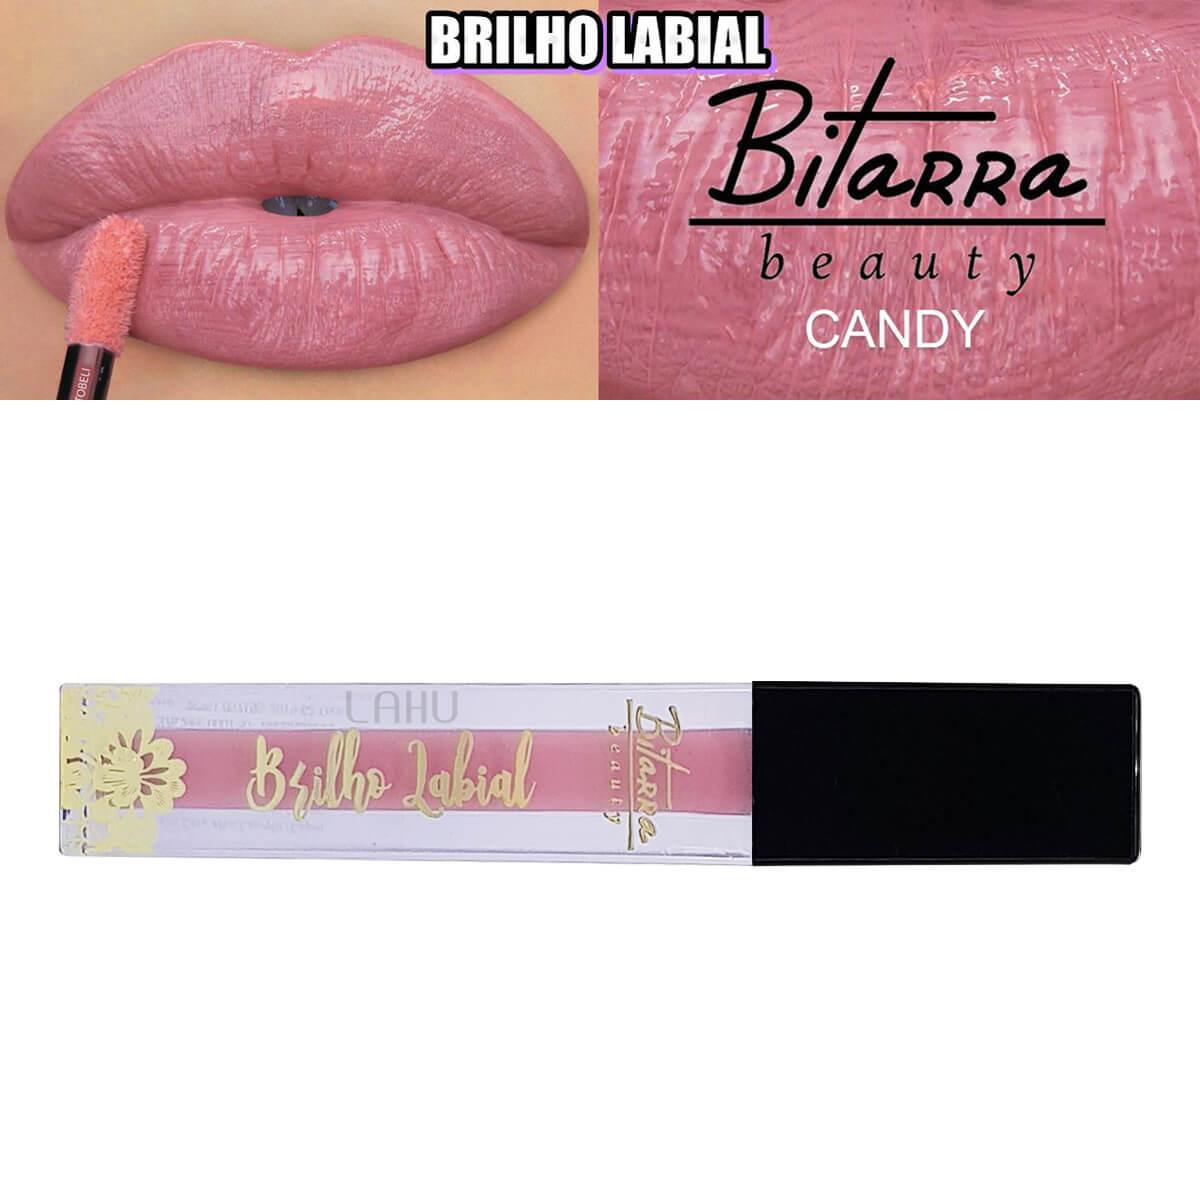 Brilho Labial Candy Bitarra